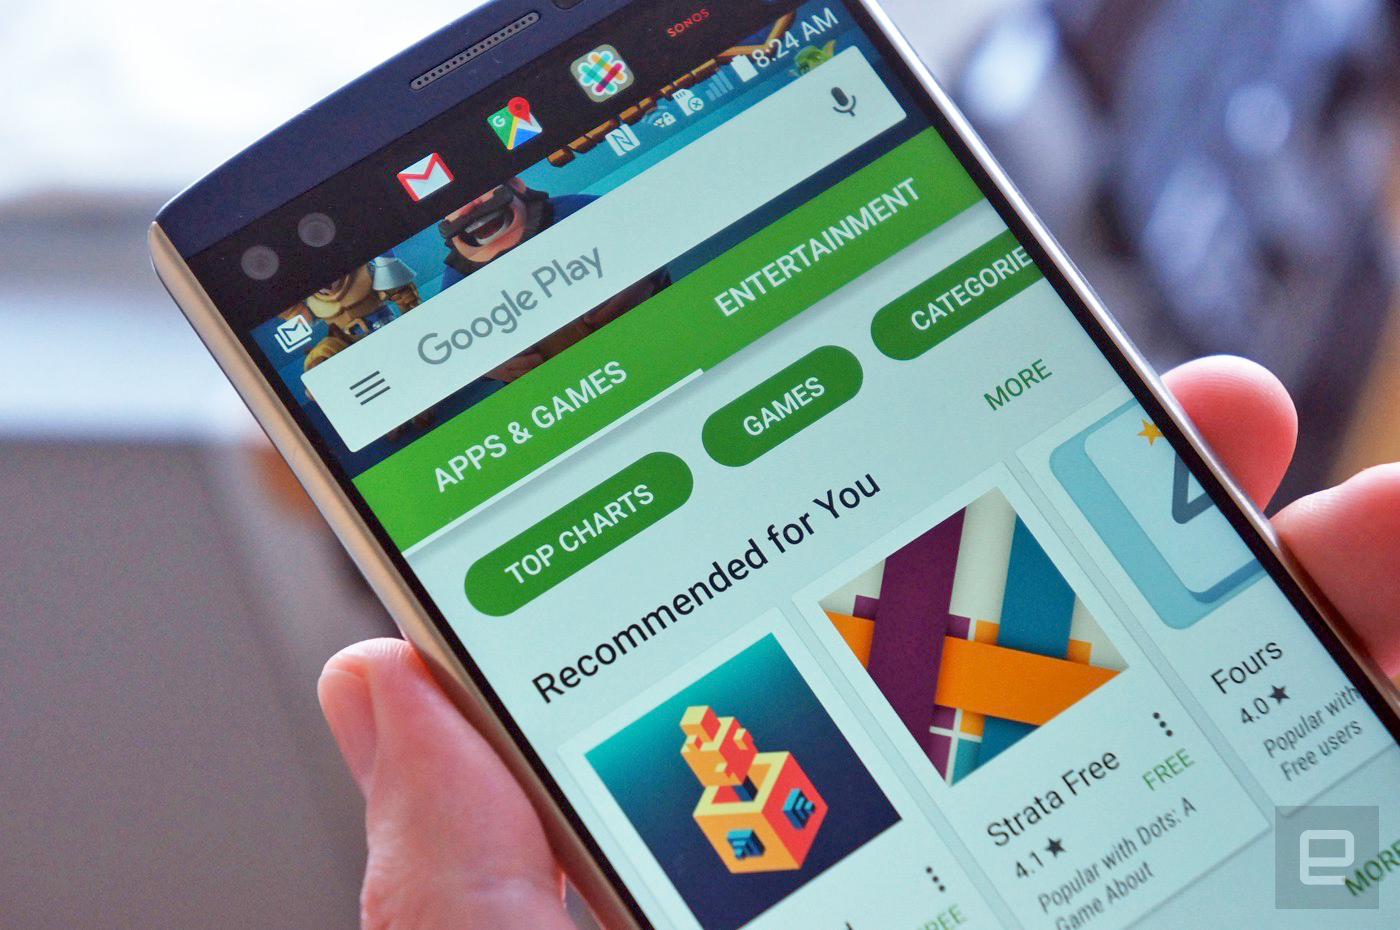 10 Aplikasi Android Yang Dulu Terkenal Namun Sekarang Sepi Peminat